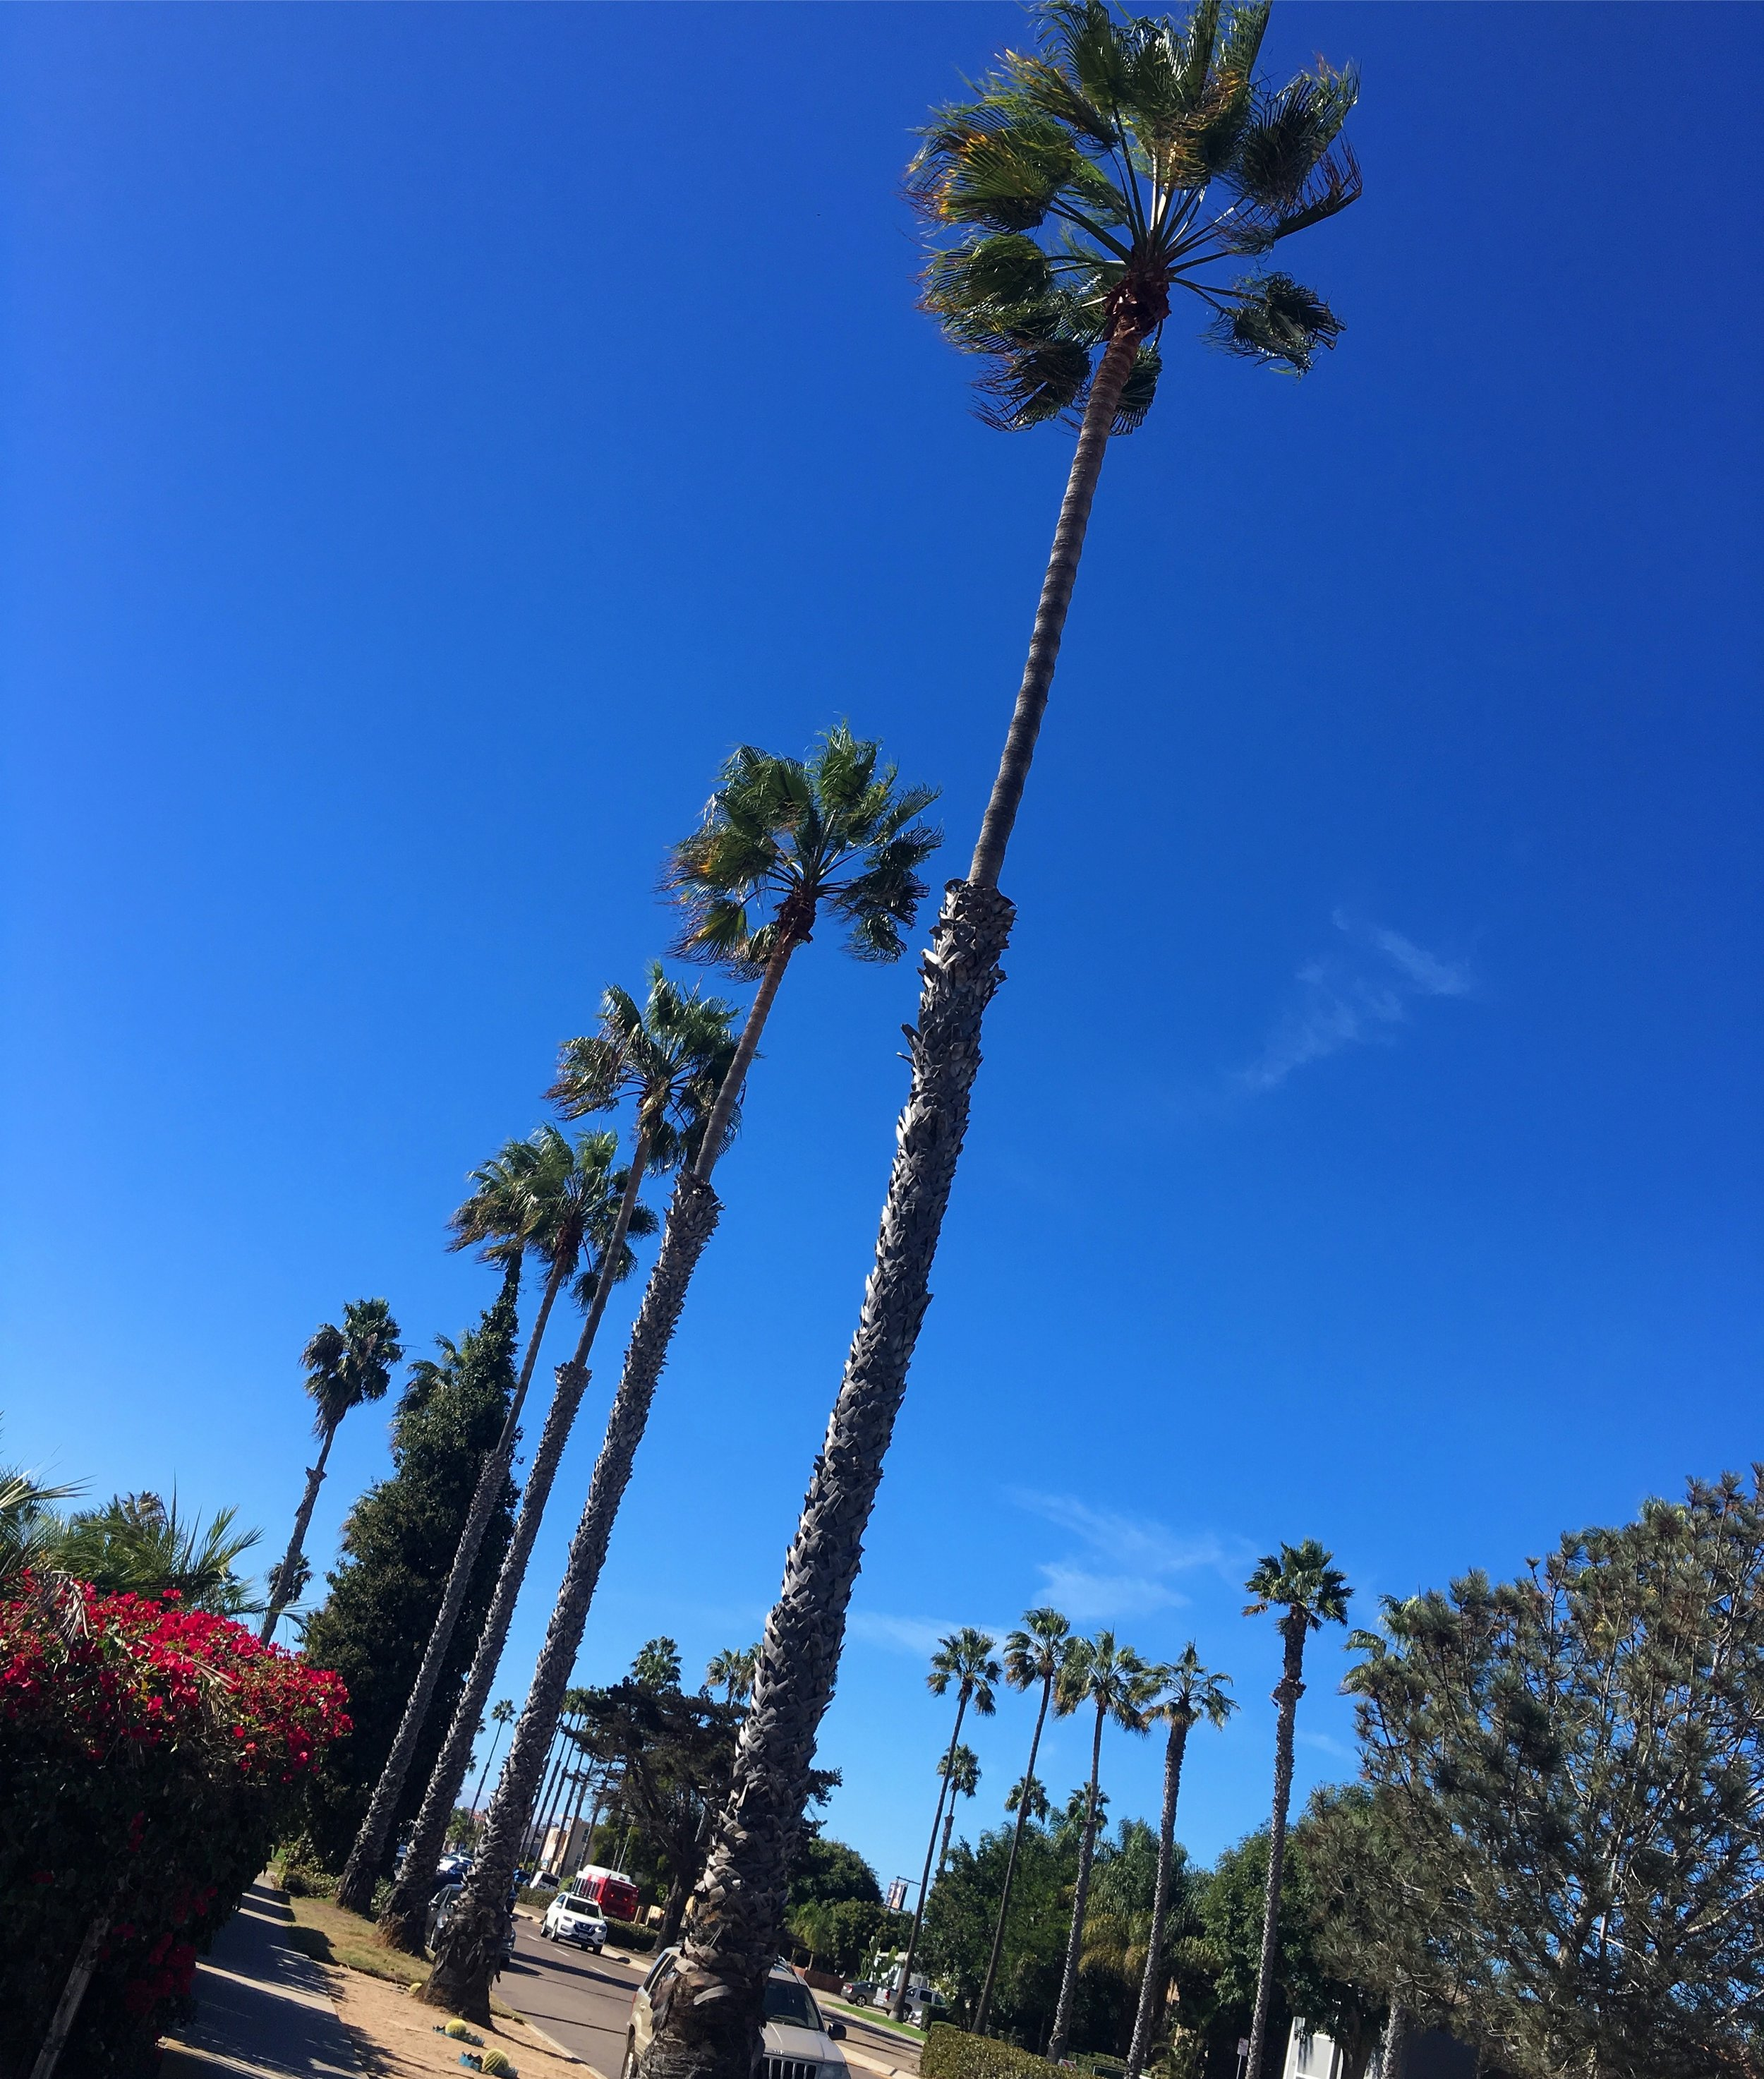 Goaltraveler_San diego_palm trees.JPG